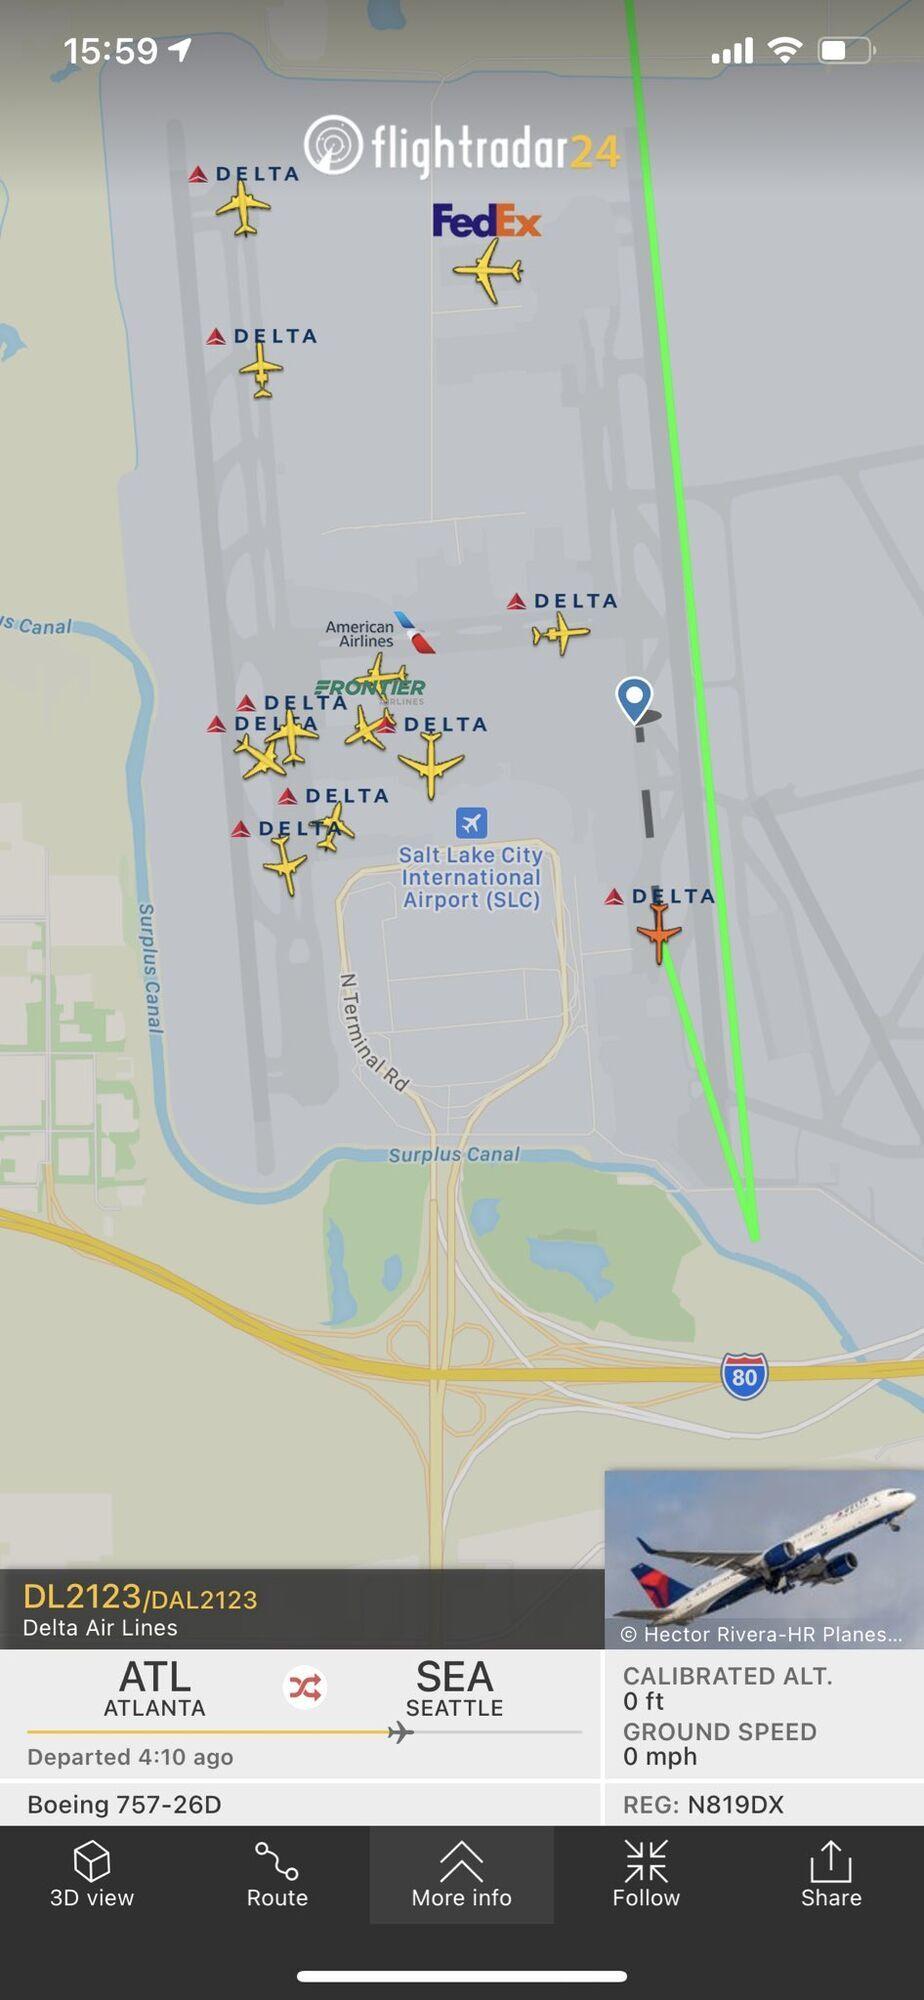 Рейс 2123 совершил аварийную посадку в Солт-Лейк-Сити